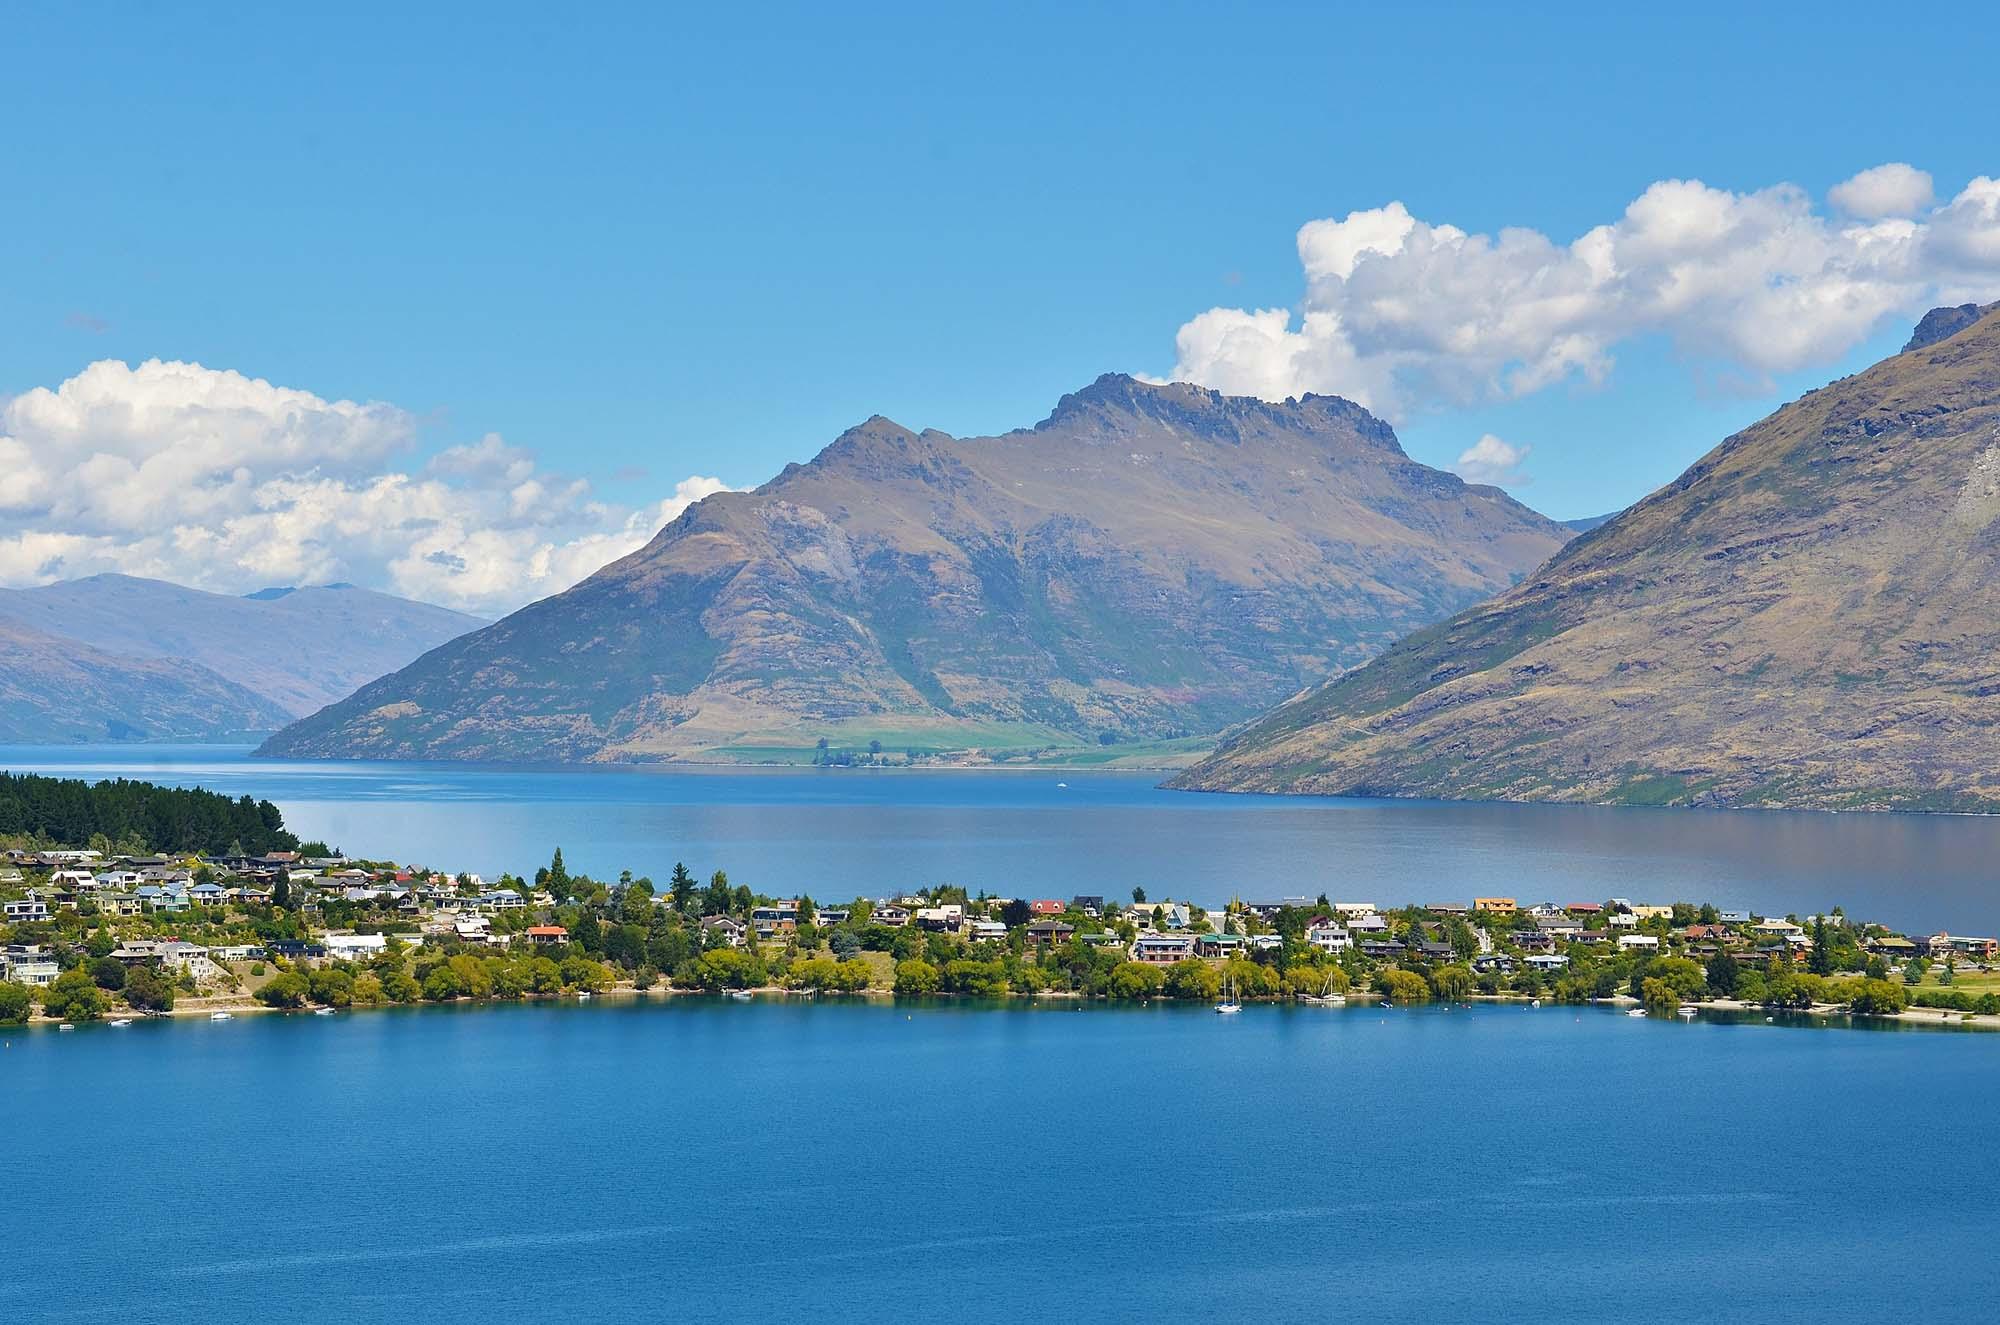 Bergs landskap i Nya Zeeland